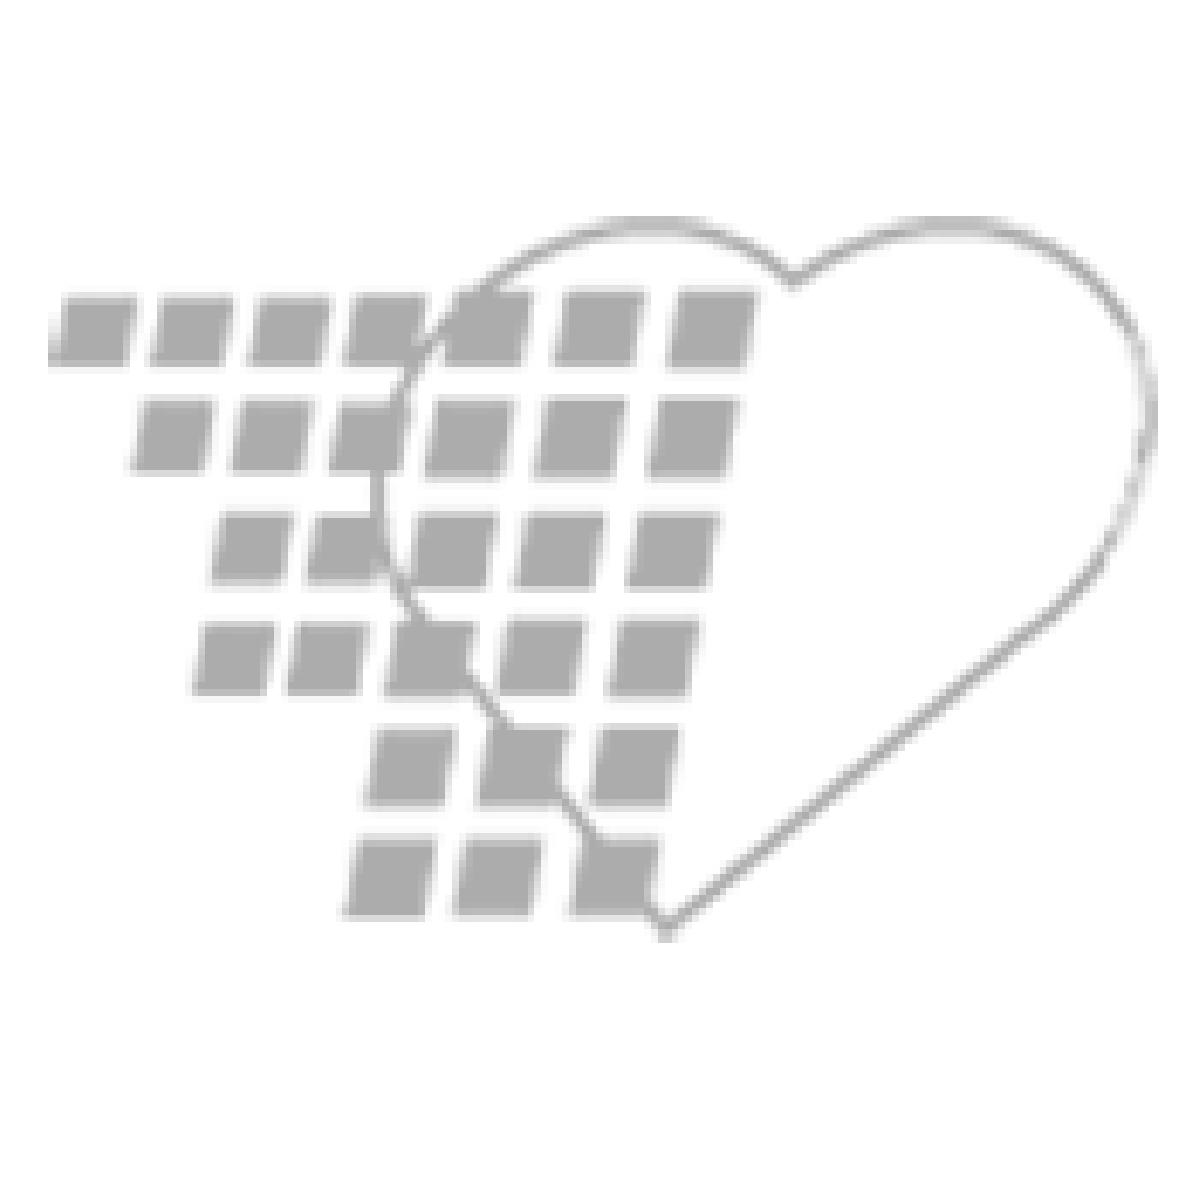 06-93-3425 - Demo Dose® Med Dispense® Medication Dispensing System